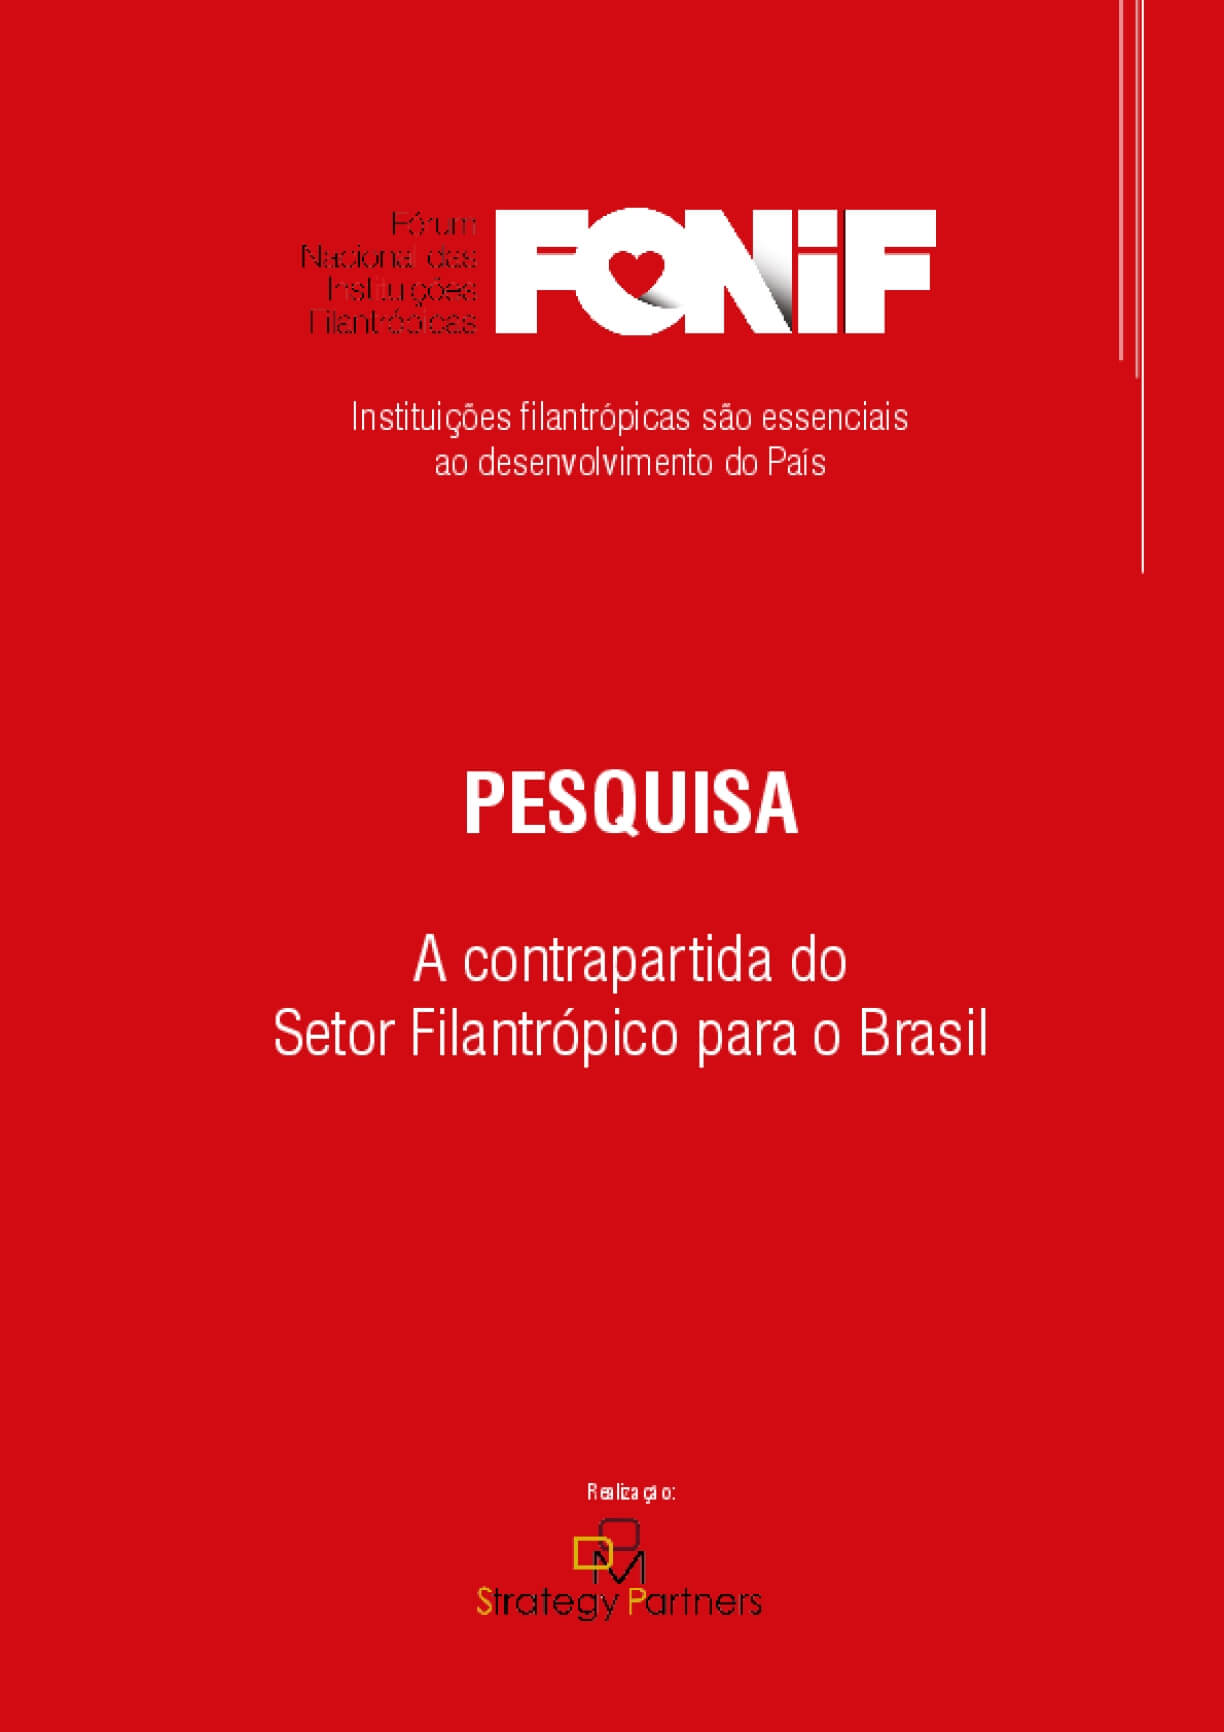 A contrapartida do Setor Filantrópico para o Brasil http://www.participa.br/articles/public/